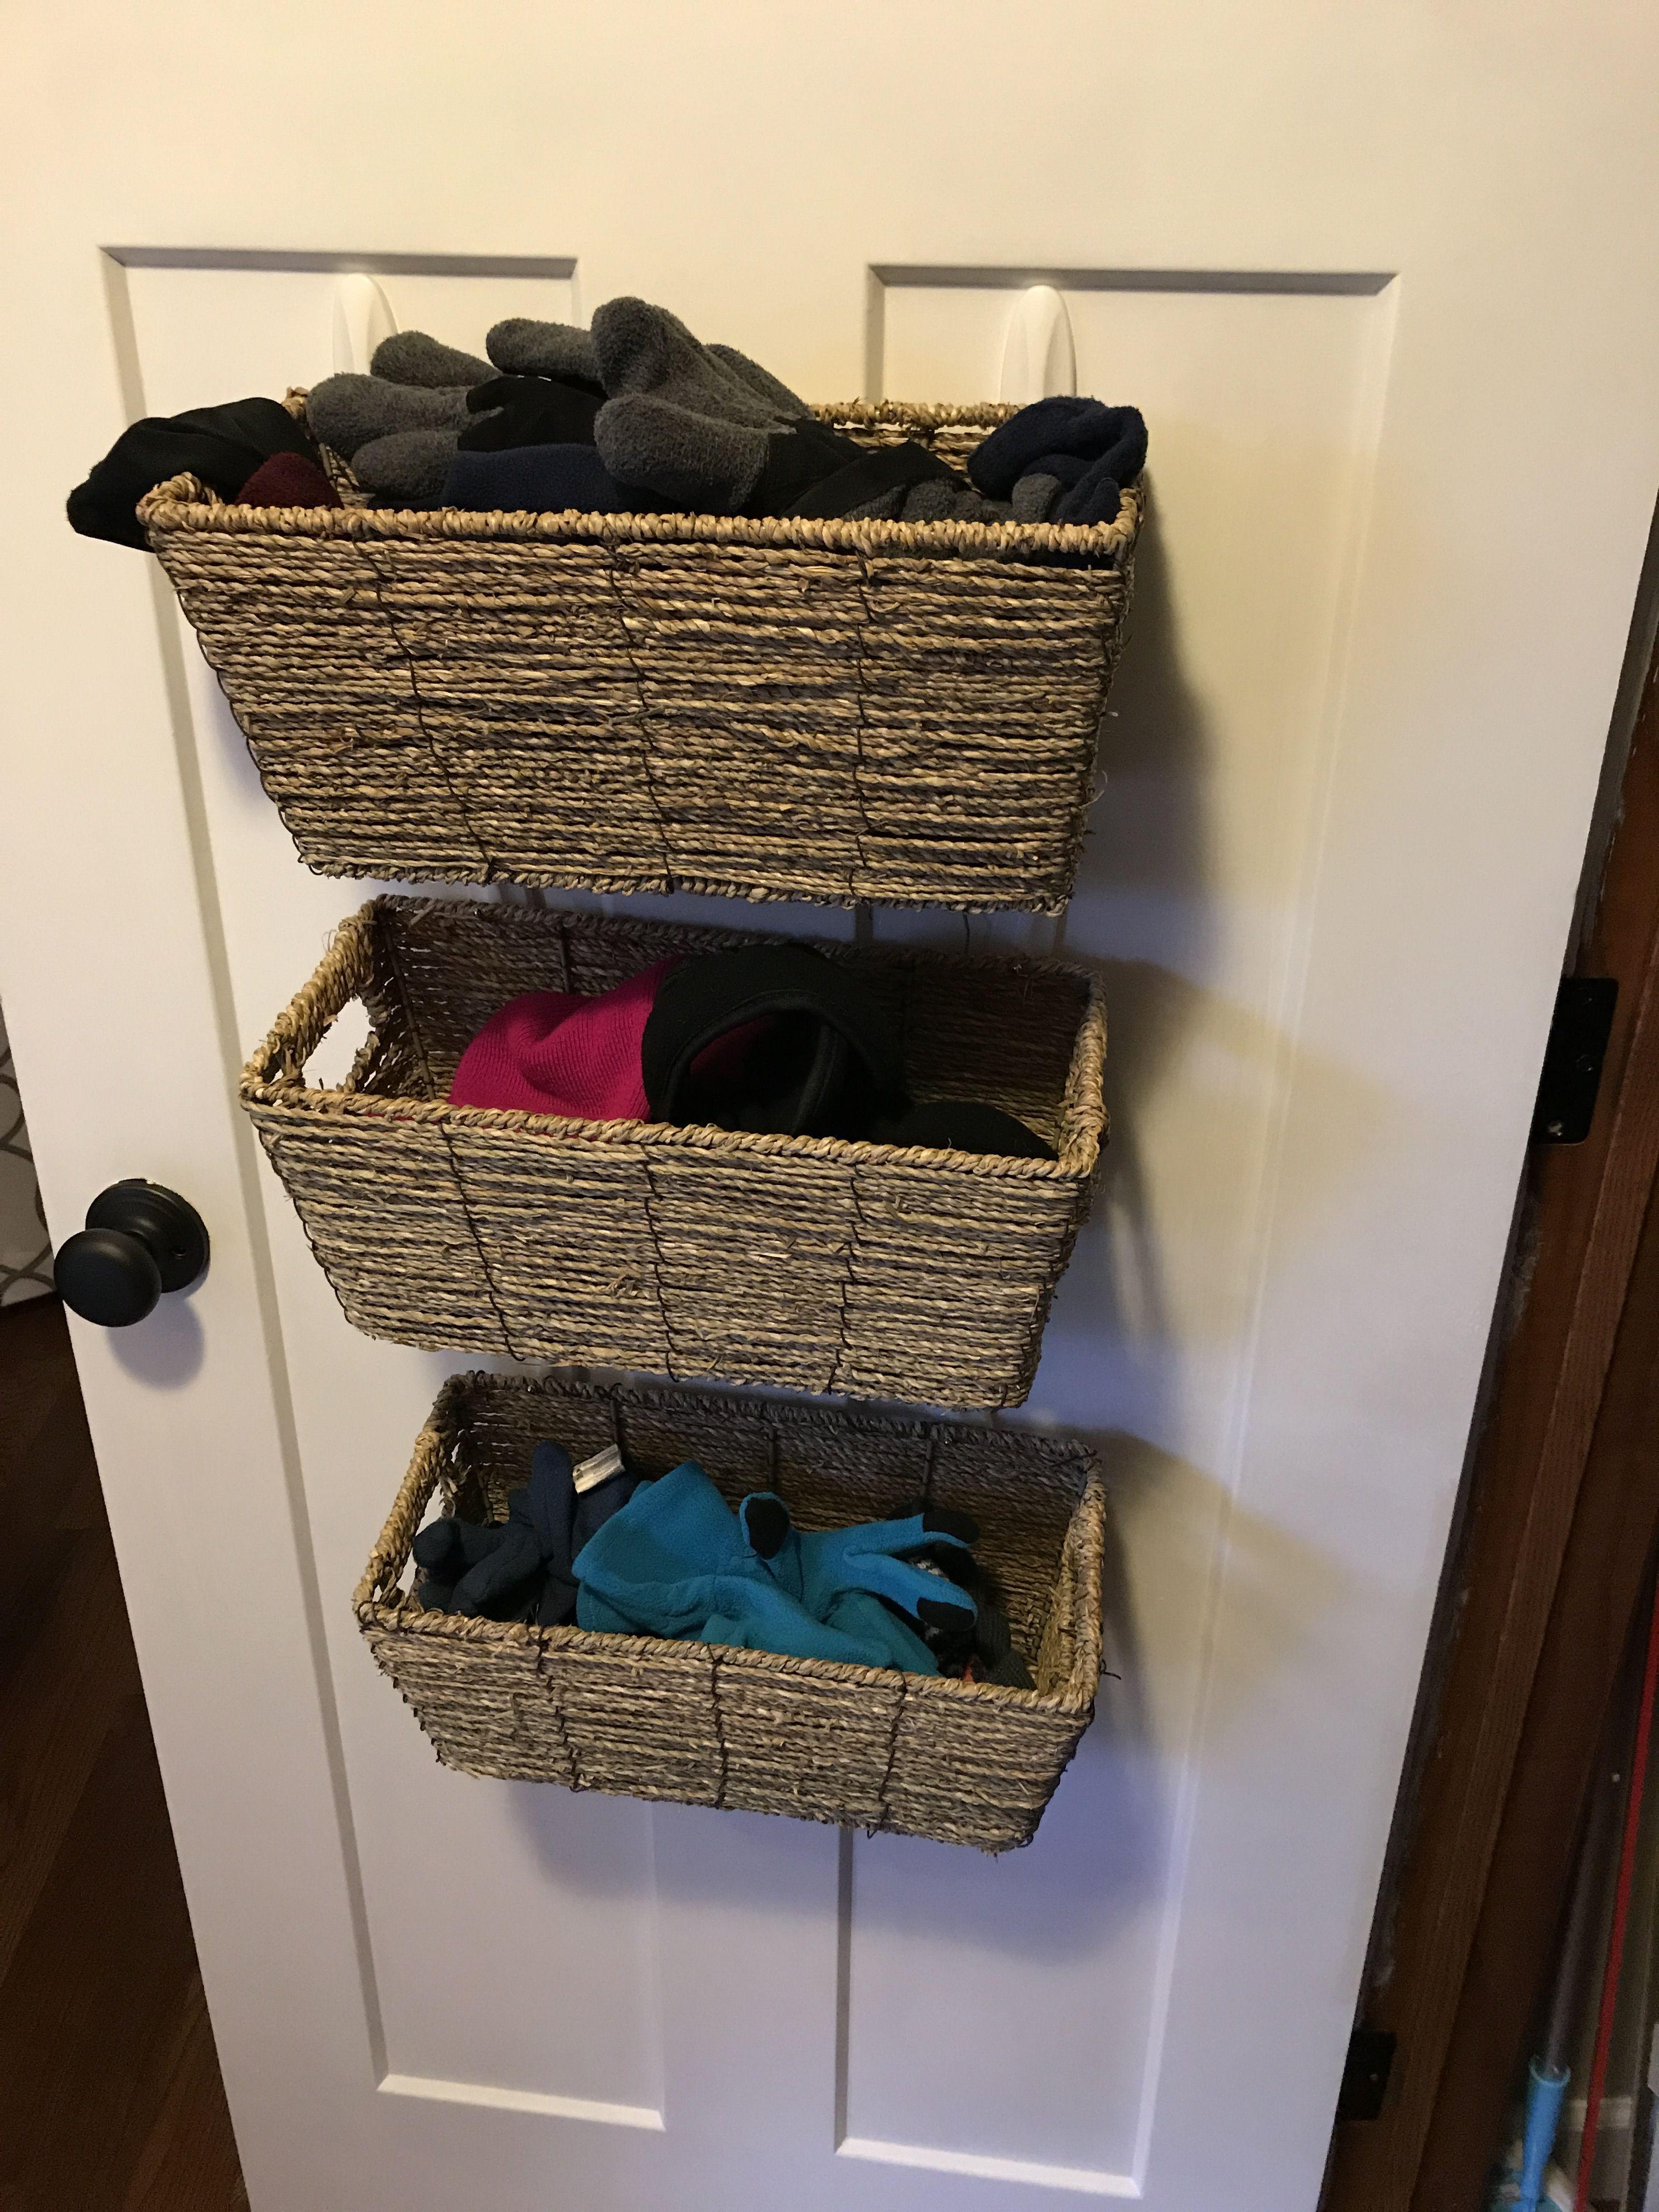 Closet organizer for hats and gloves closet organization